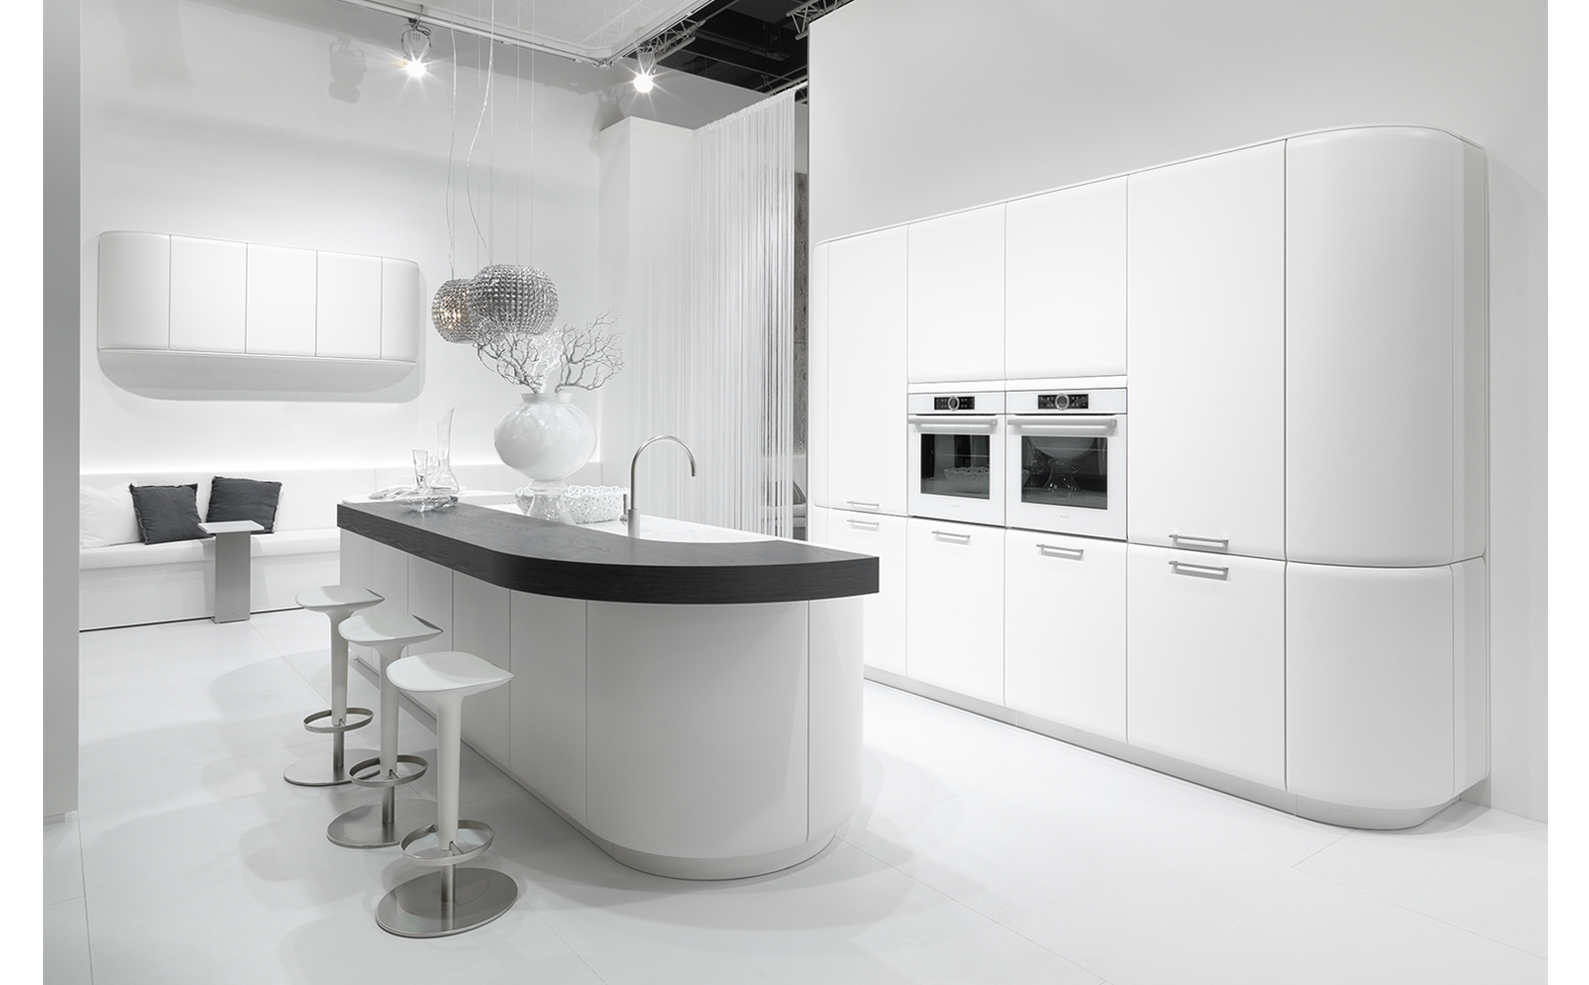 Berühmt Individuelles Design Küchen Sydney Fotos - Küche Set Ideen ...